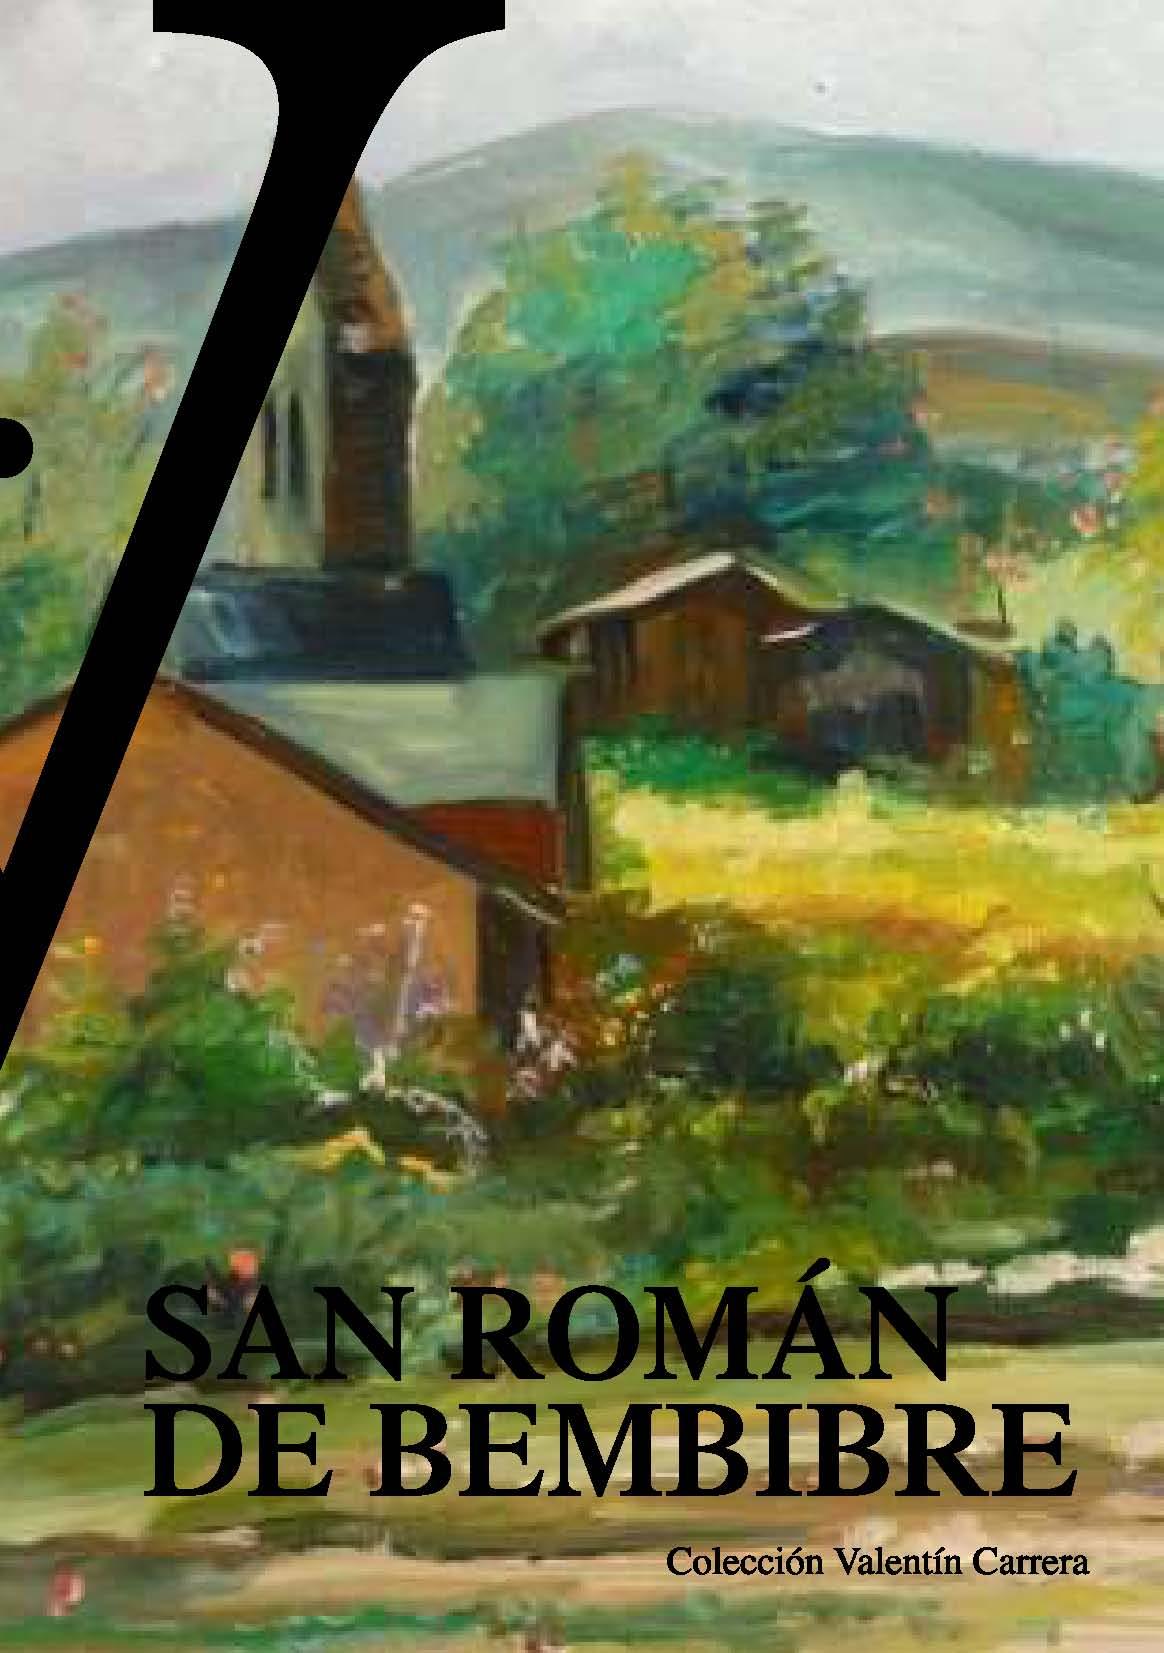 San Román de Bembibre